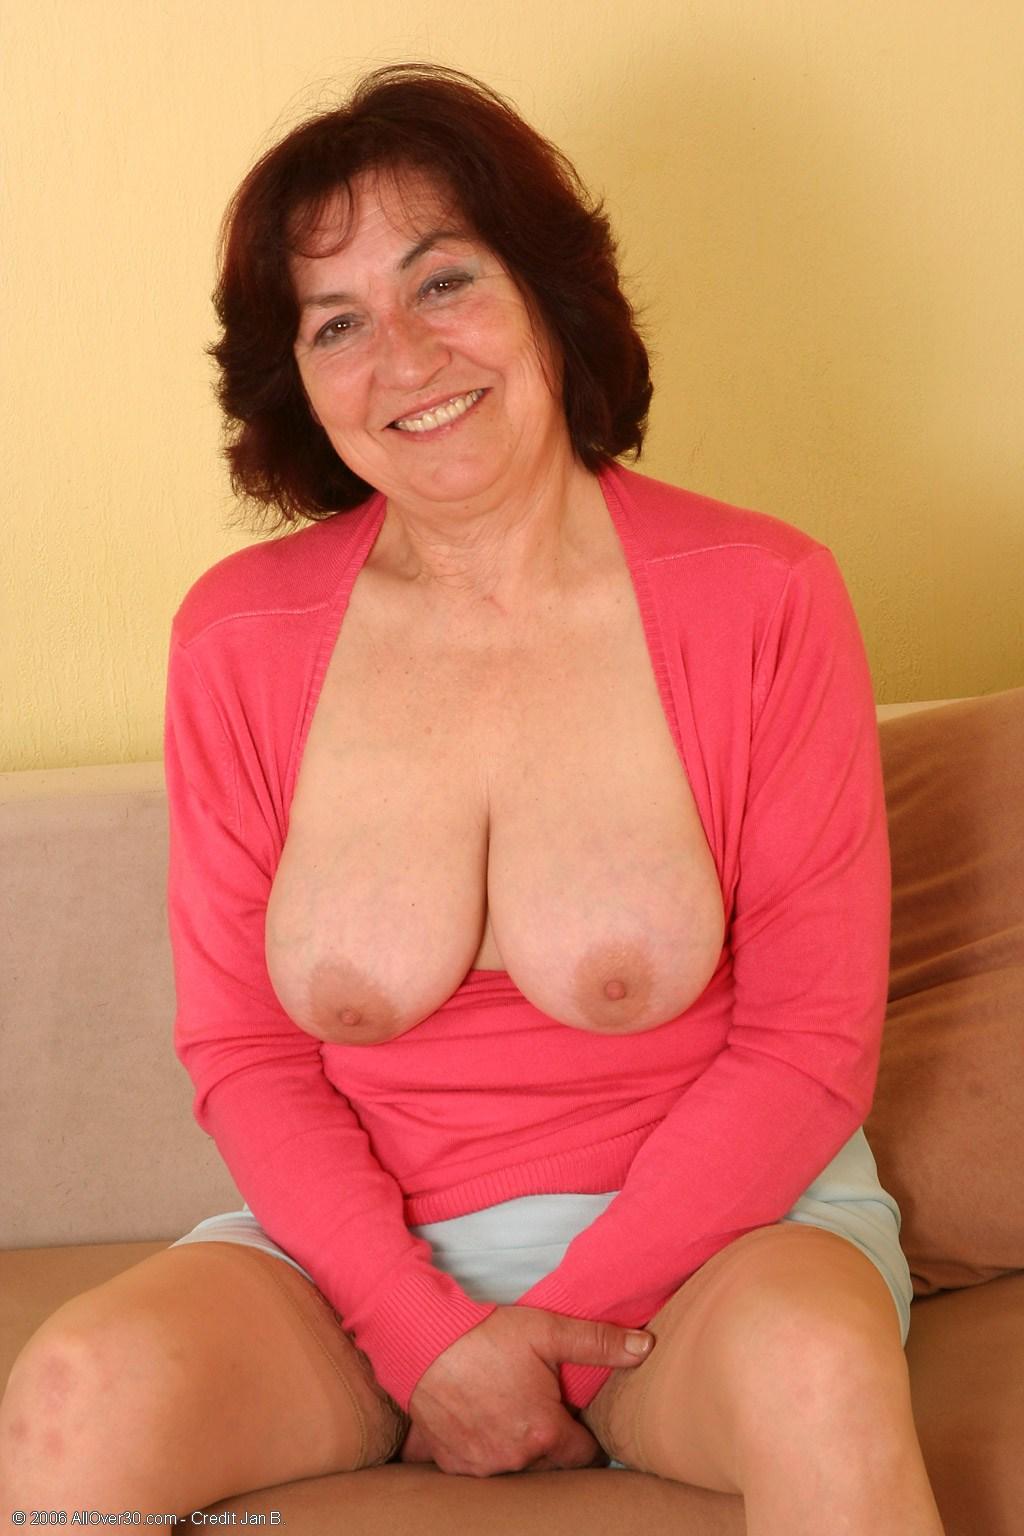 Veronika zemanova nude pics-4842